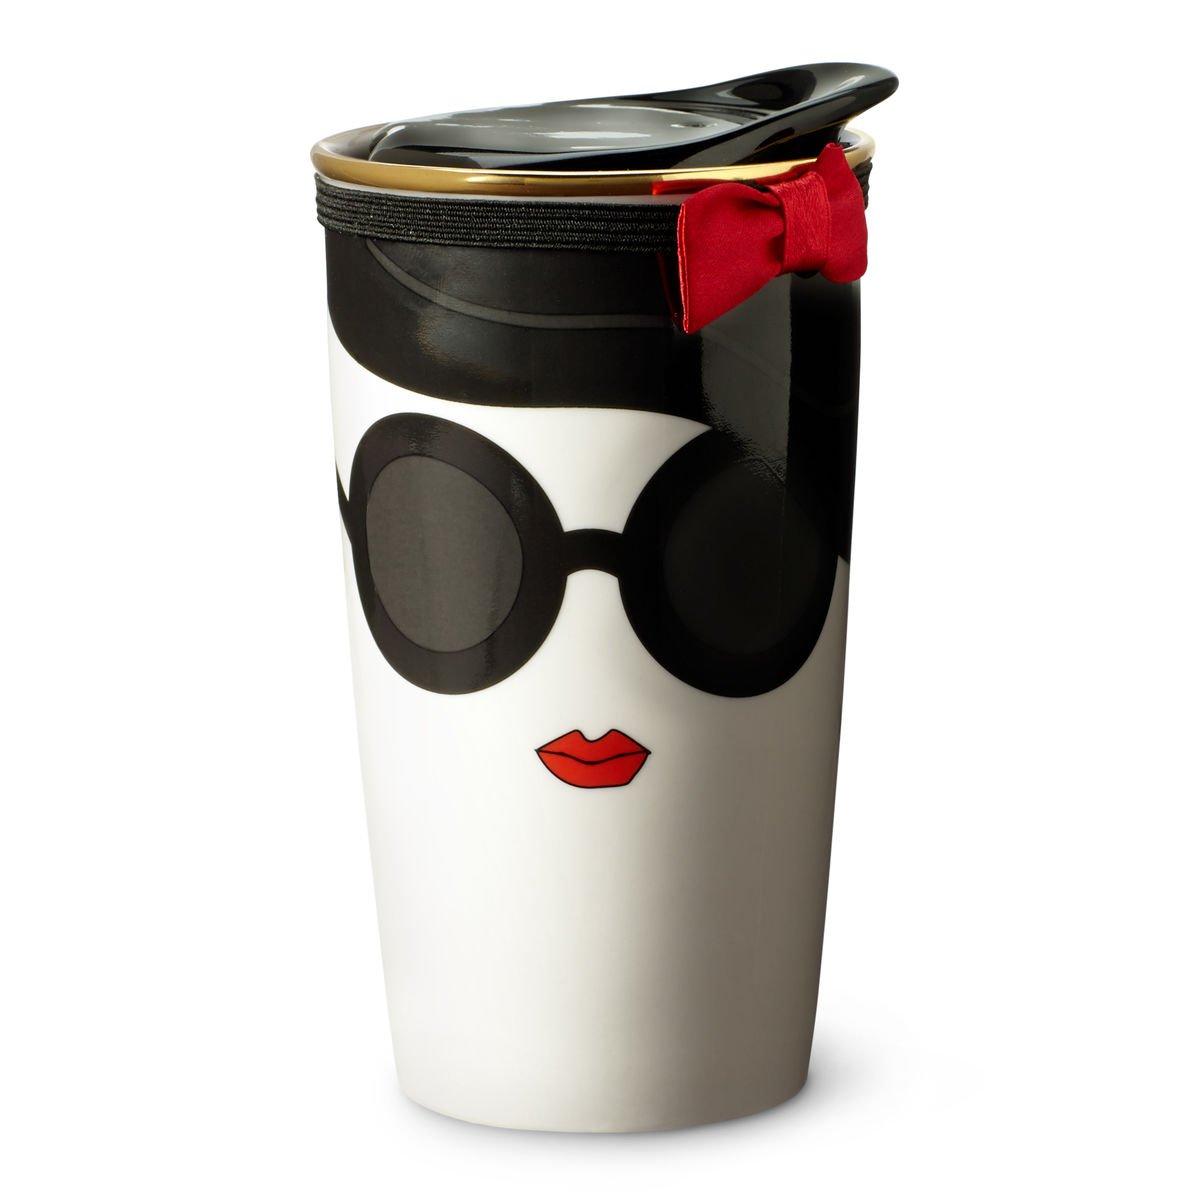 Starbucks Alice + Olivia Double Wall Traveler Mug - Stace Face, 12 fl oz by Starbucks